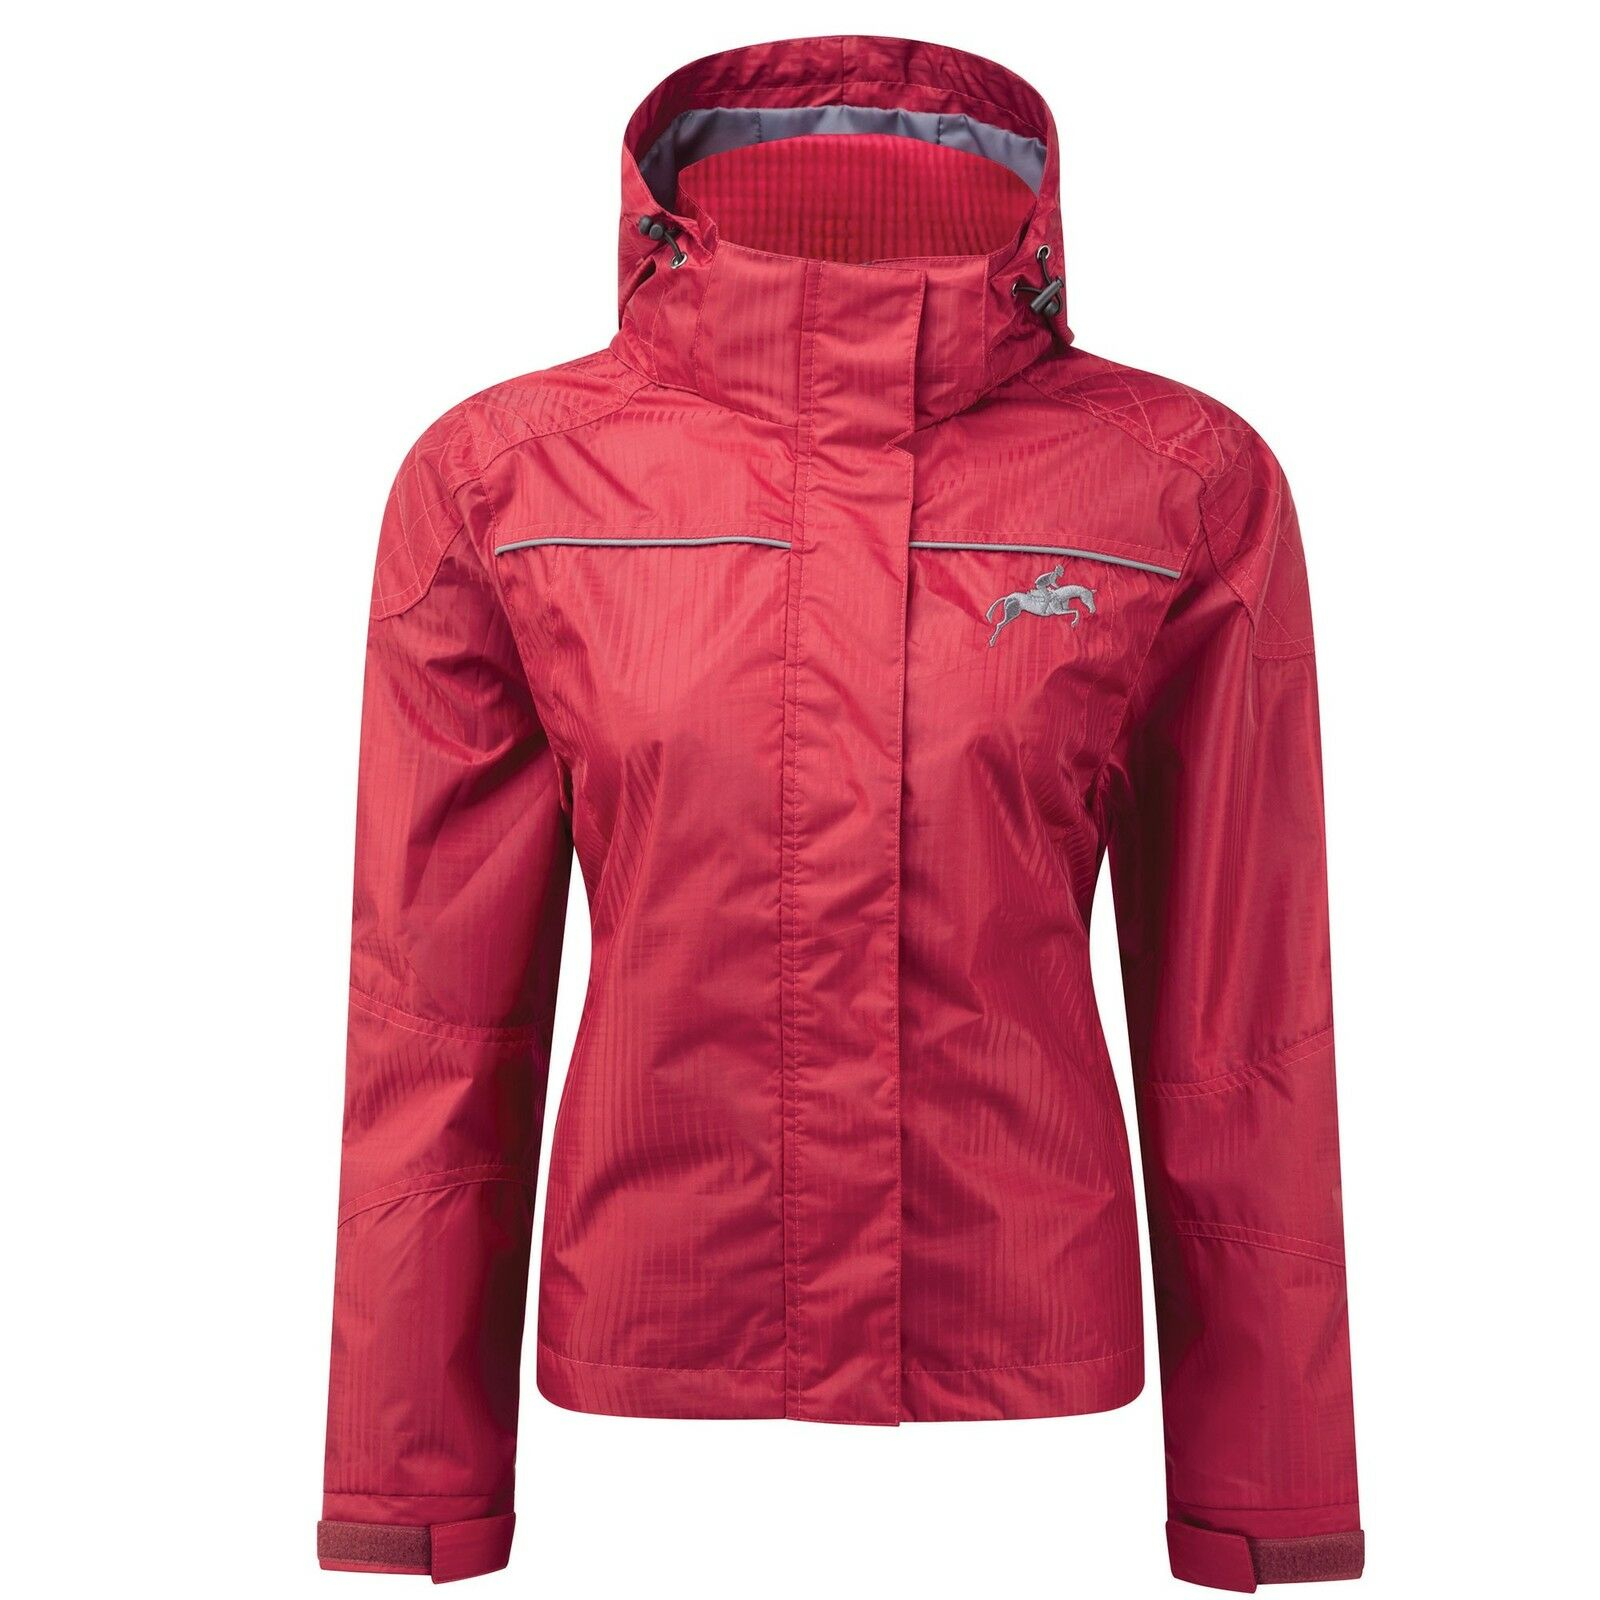 Harry Hall Ellerton Jacket - Equestrian Lightweight Waterproof Jacket - rot